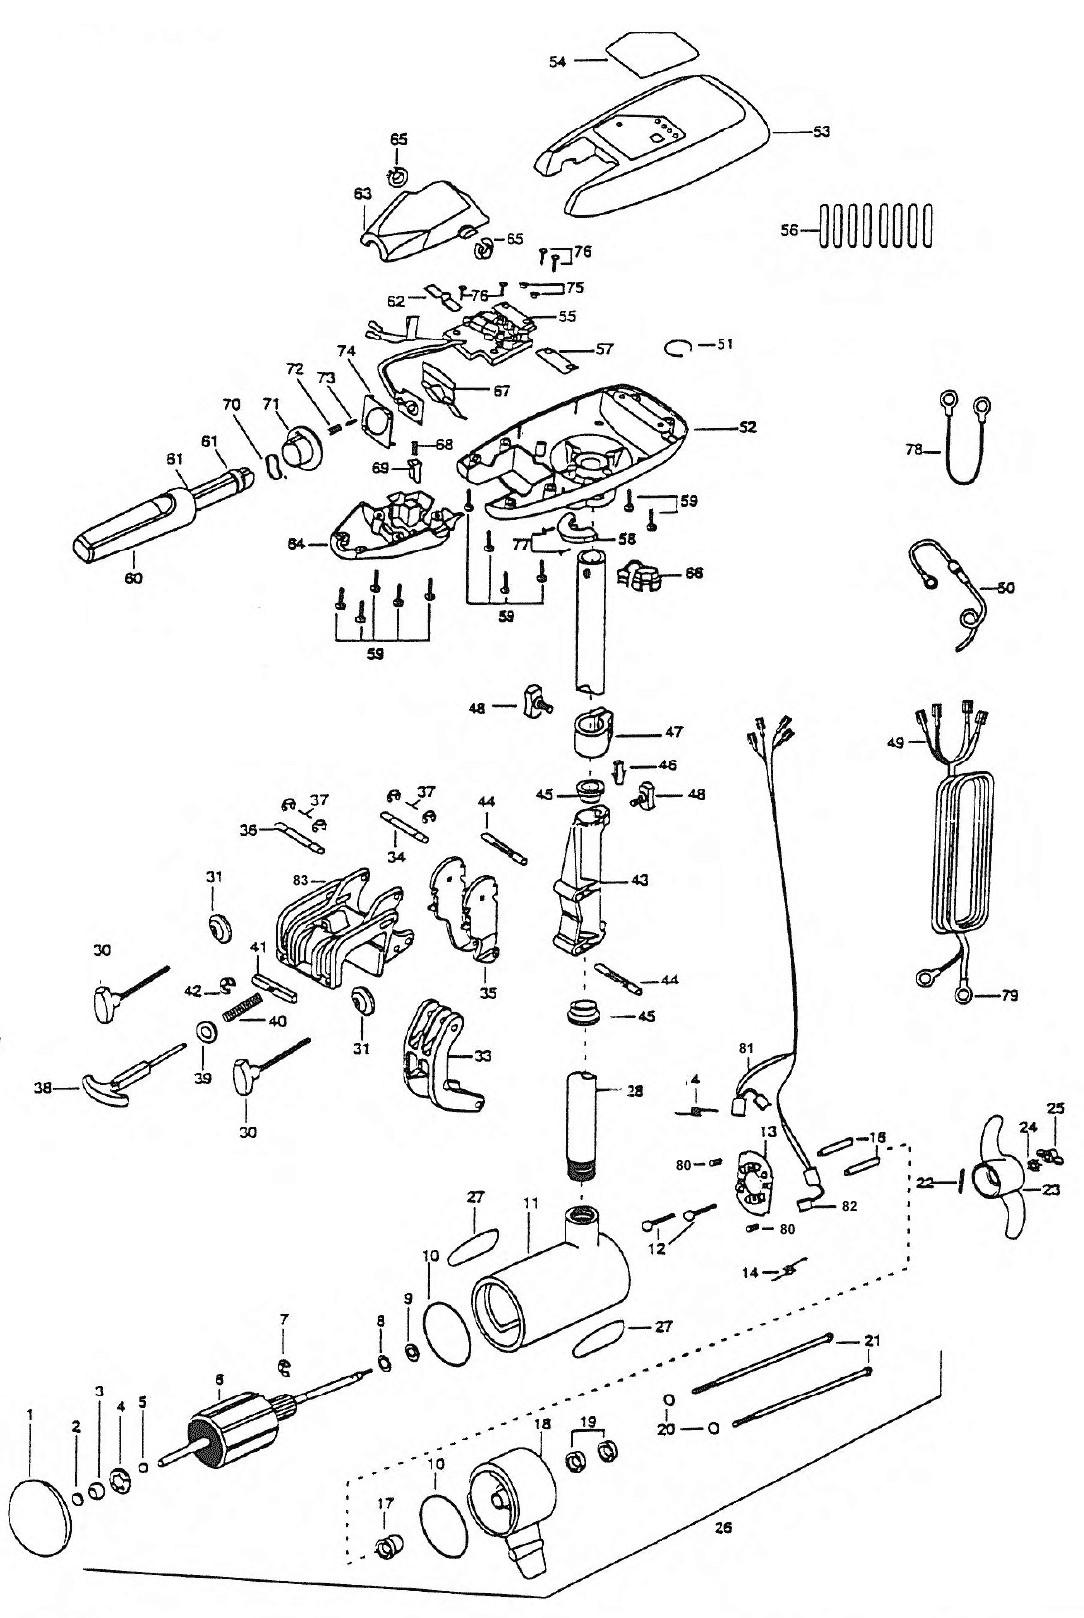 Minn Kota Turbo Pro 42 At Manual Briggs And Stratton 60500 Series Parts List Diagram Array 65 Lb Thrust All Terrain Trolling Motor Rh Motorwallpapers Org